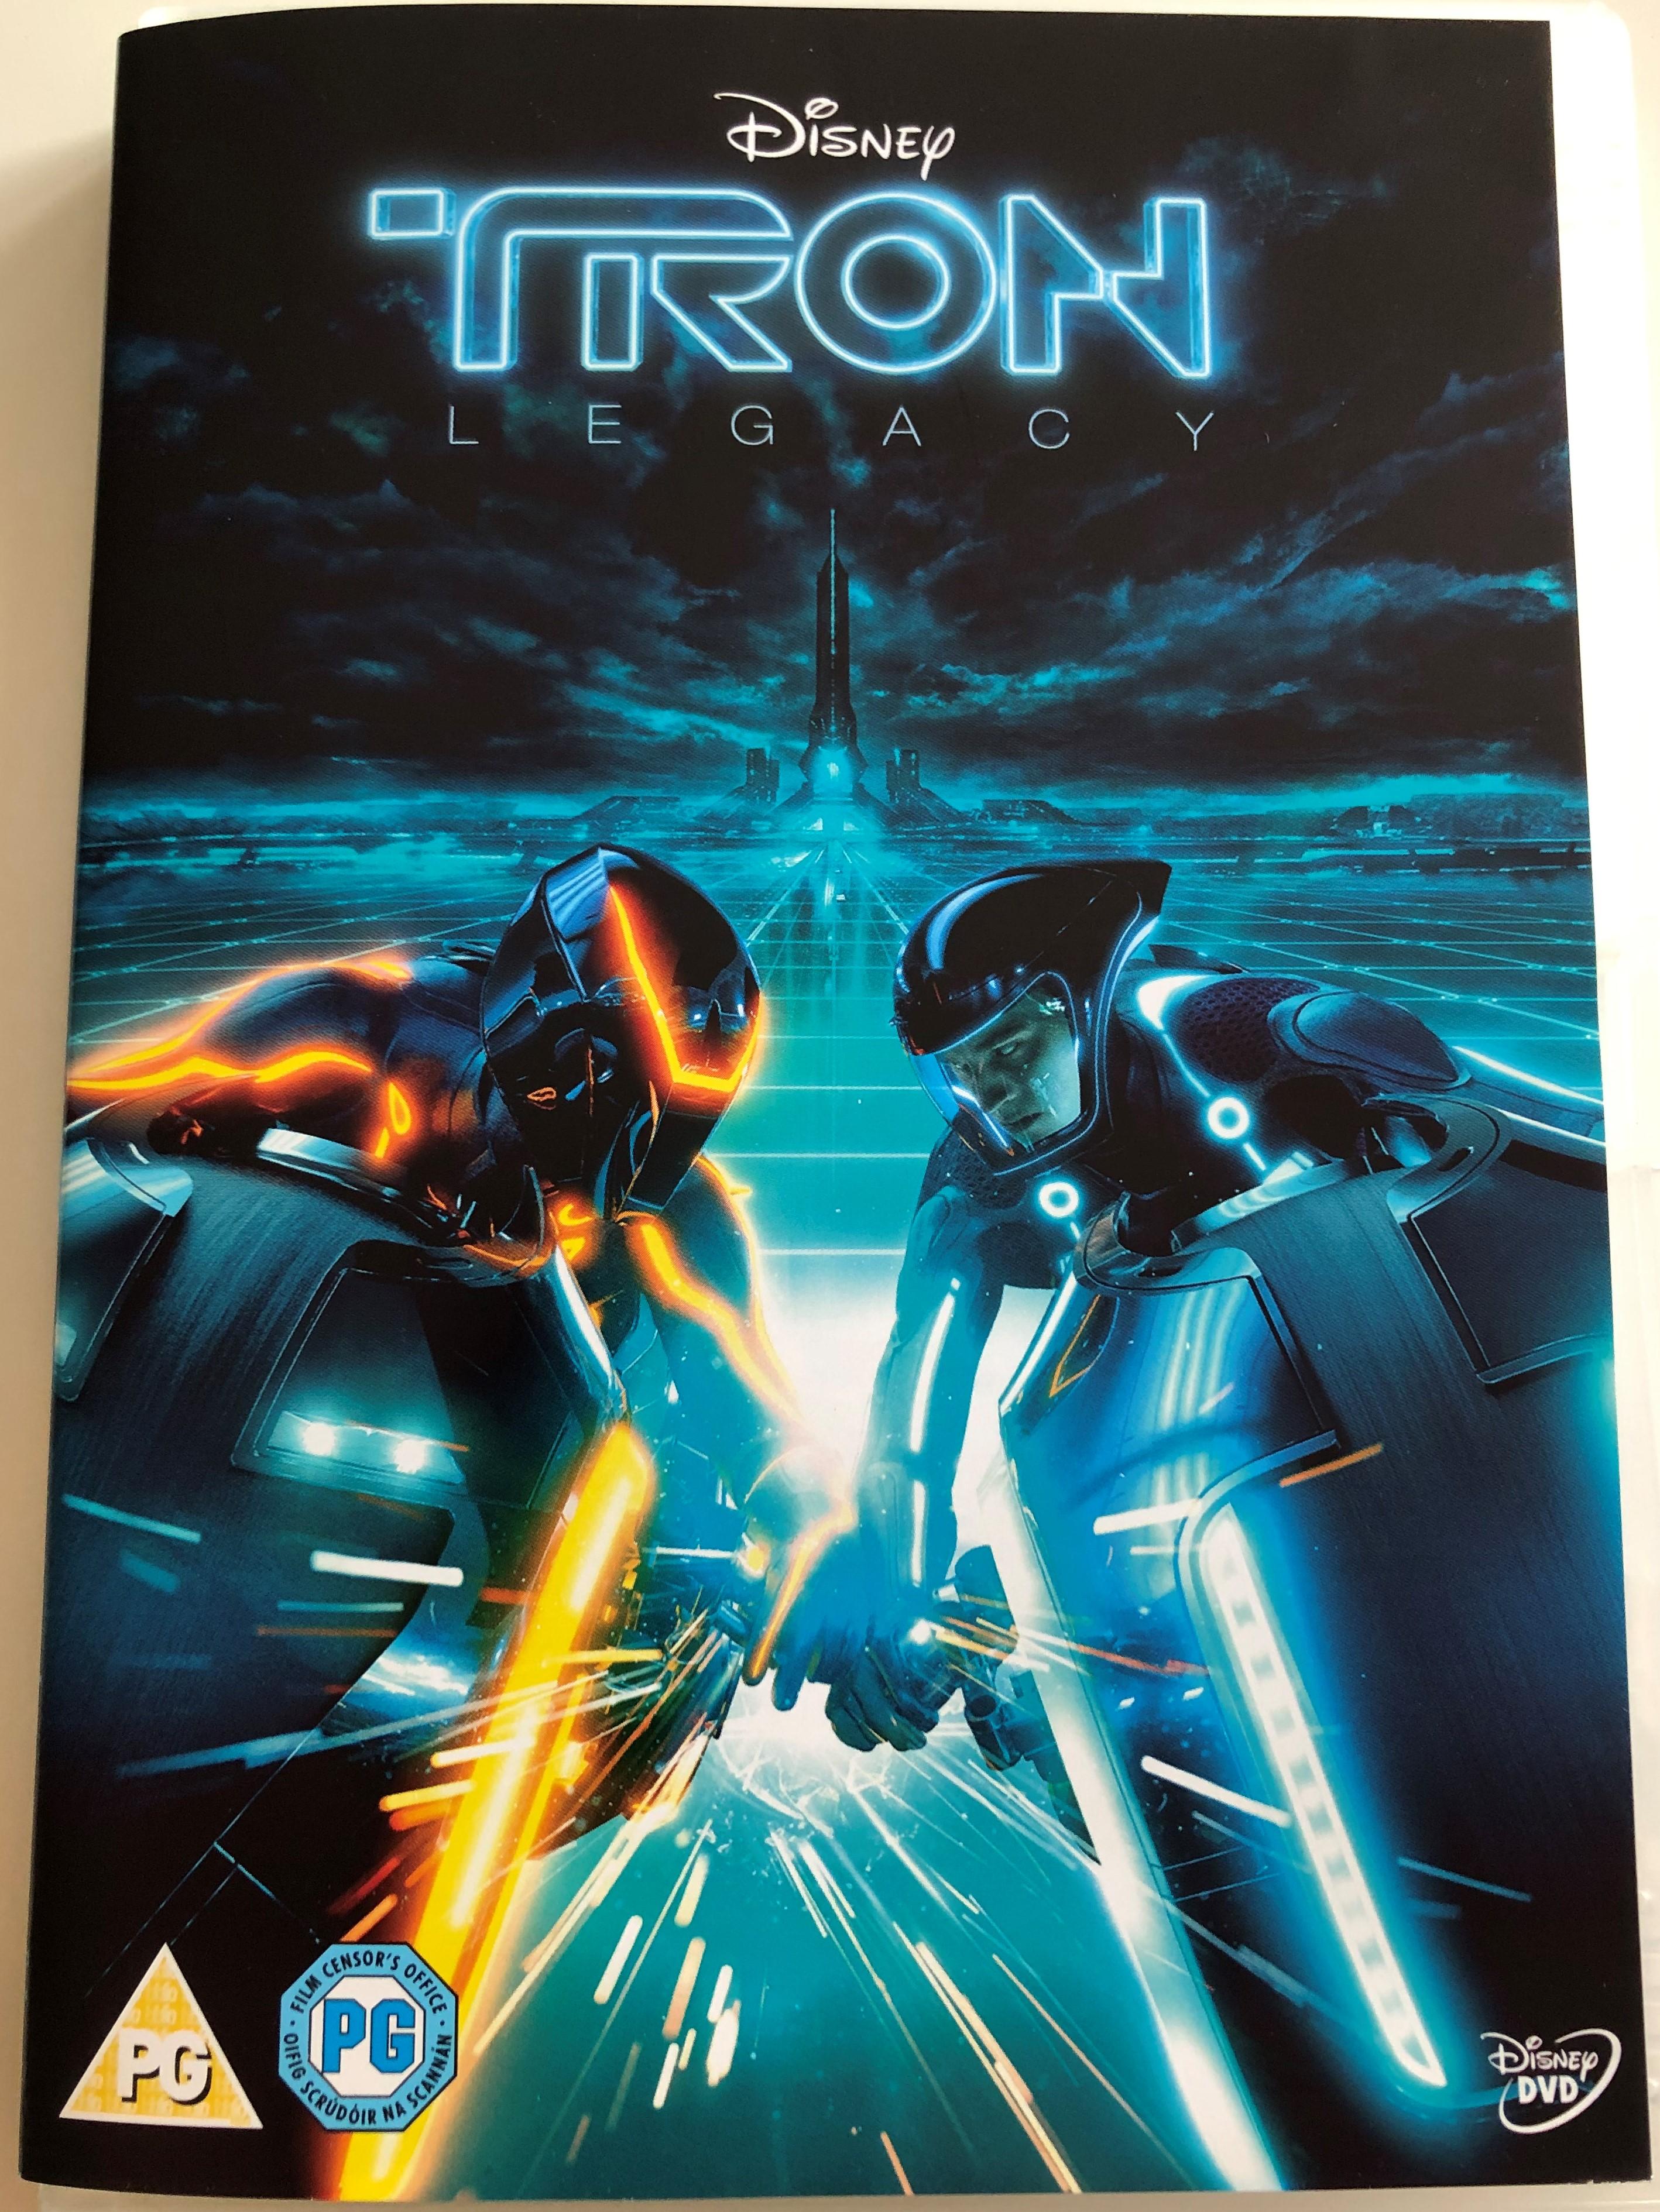 tron-legacy-dvd-2010-directed-by-joseph-kosinski-1.jpg